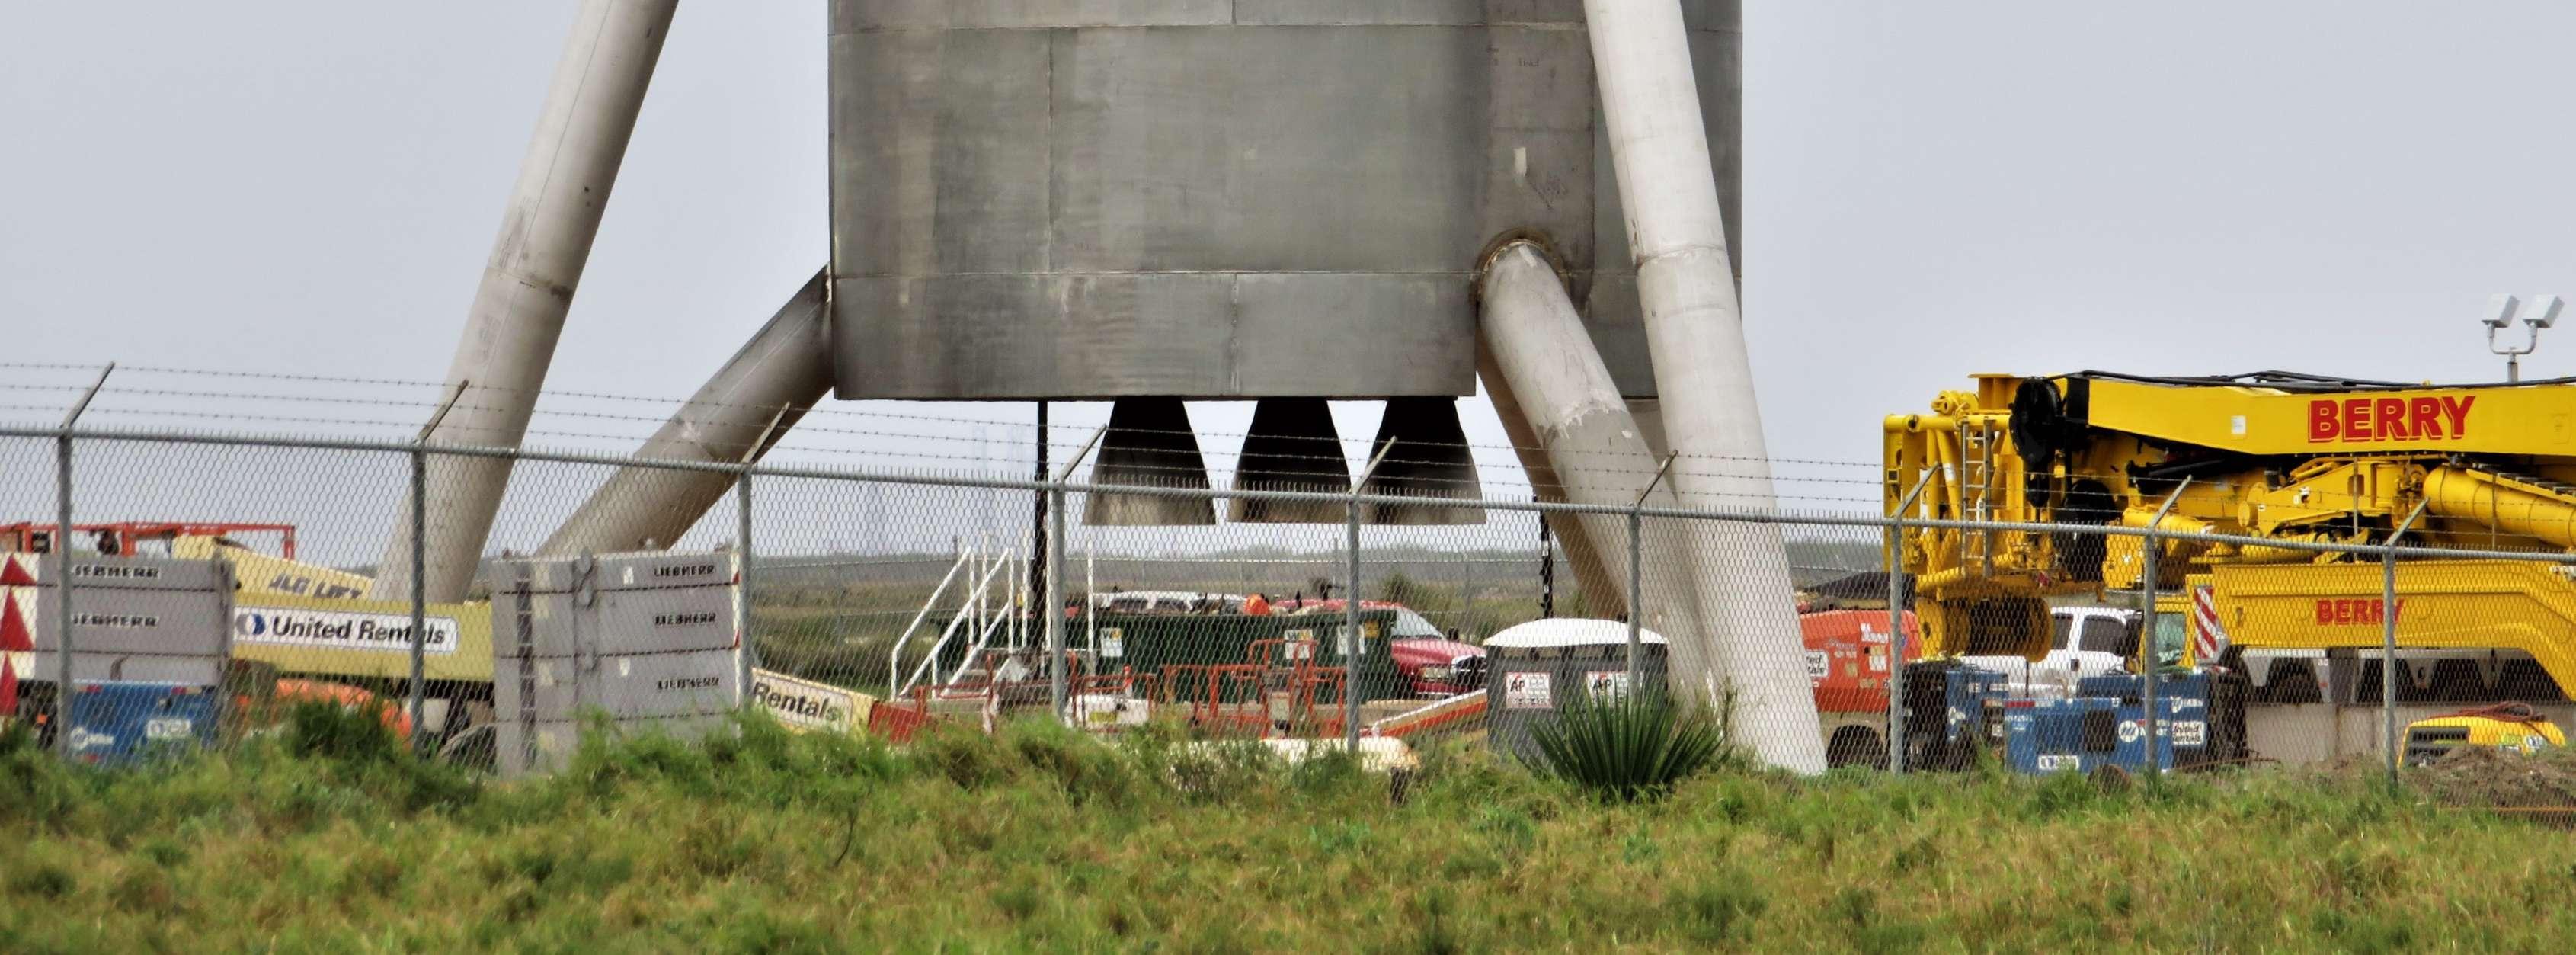 Boca Chica Starship Alpha progress 010118 (NSF – bocachicagal) 4 crop(c)